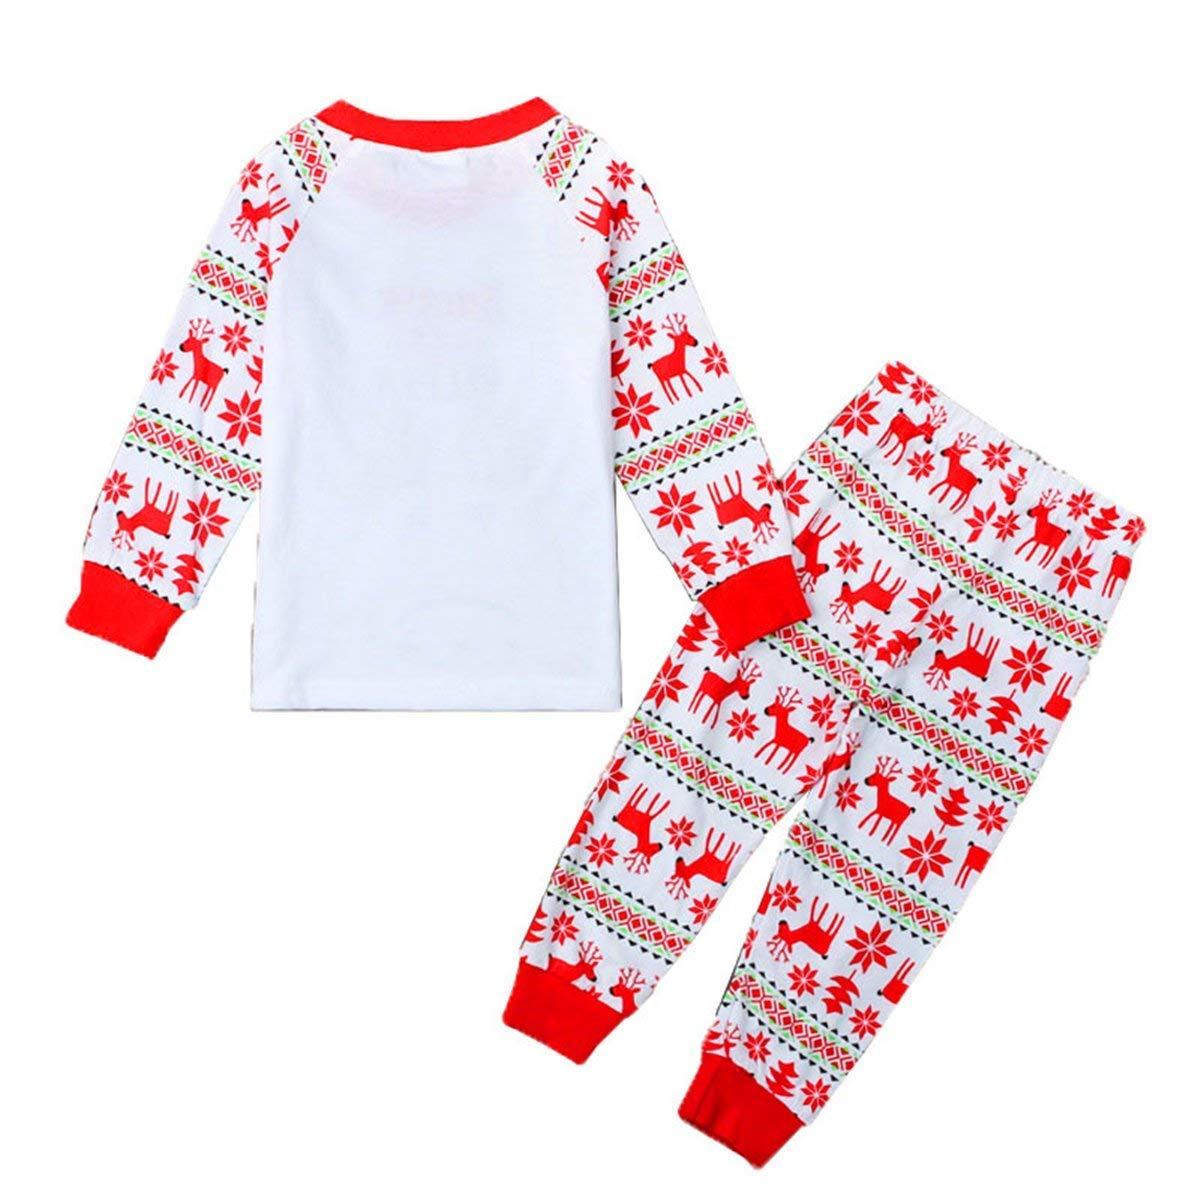 Boys Girls Christmas Pajamas Set Kids Cotton Pjs Long Sleeve Sleepwear Winter Homewear Clothes 2-7 Years